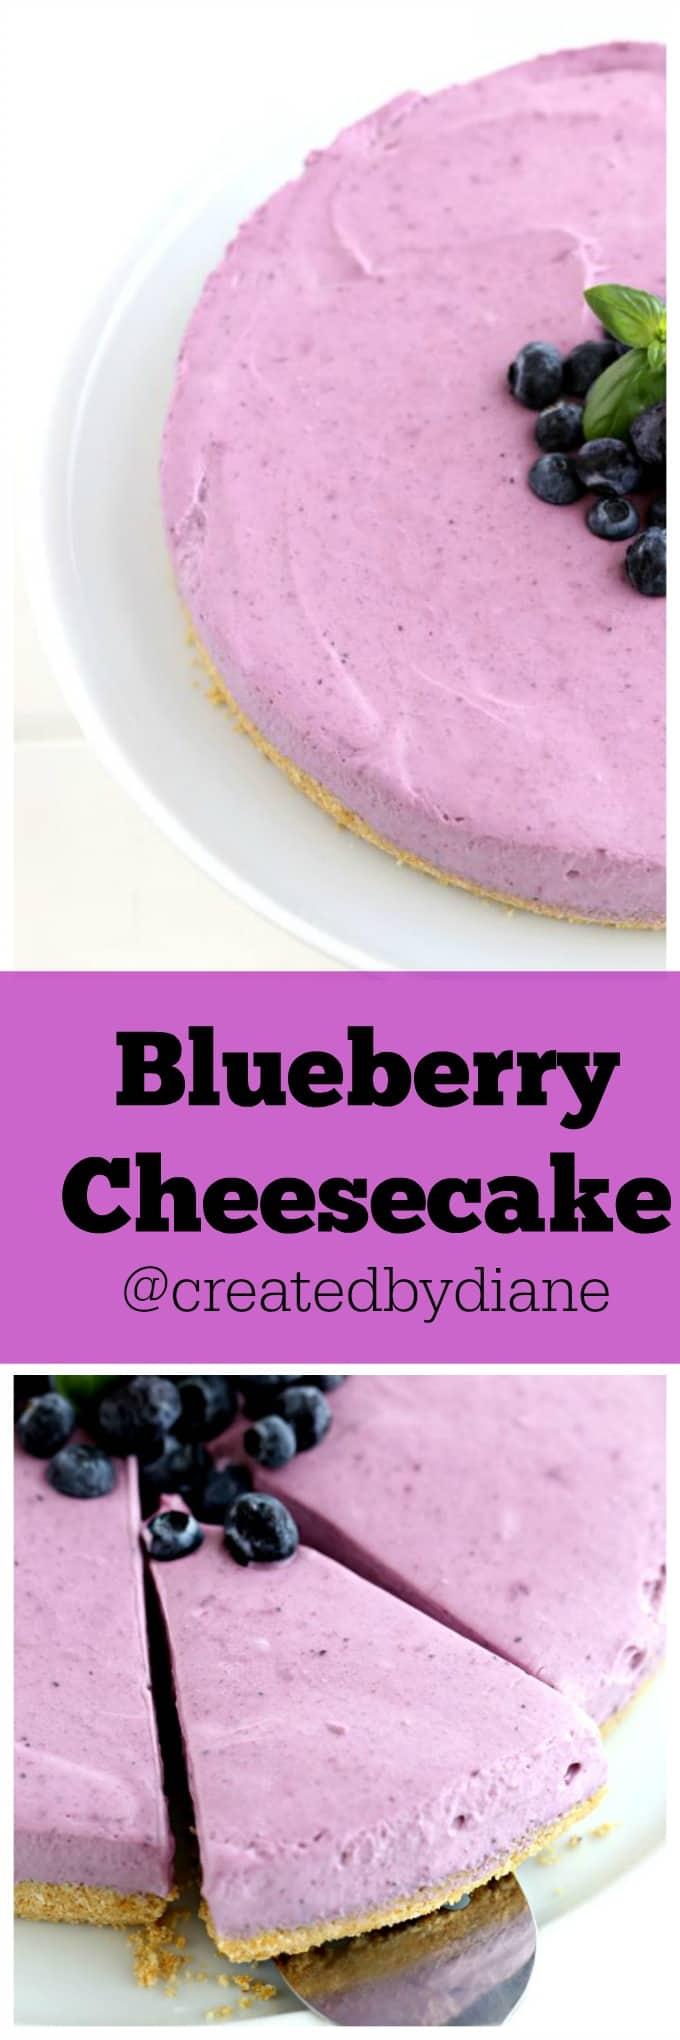 Blueberry Cheesecake @createdbydiane